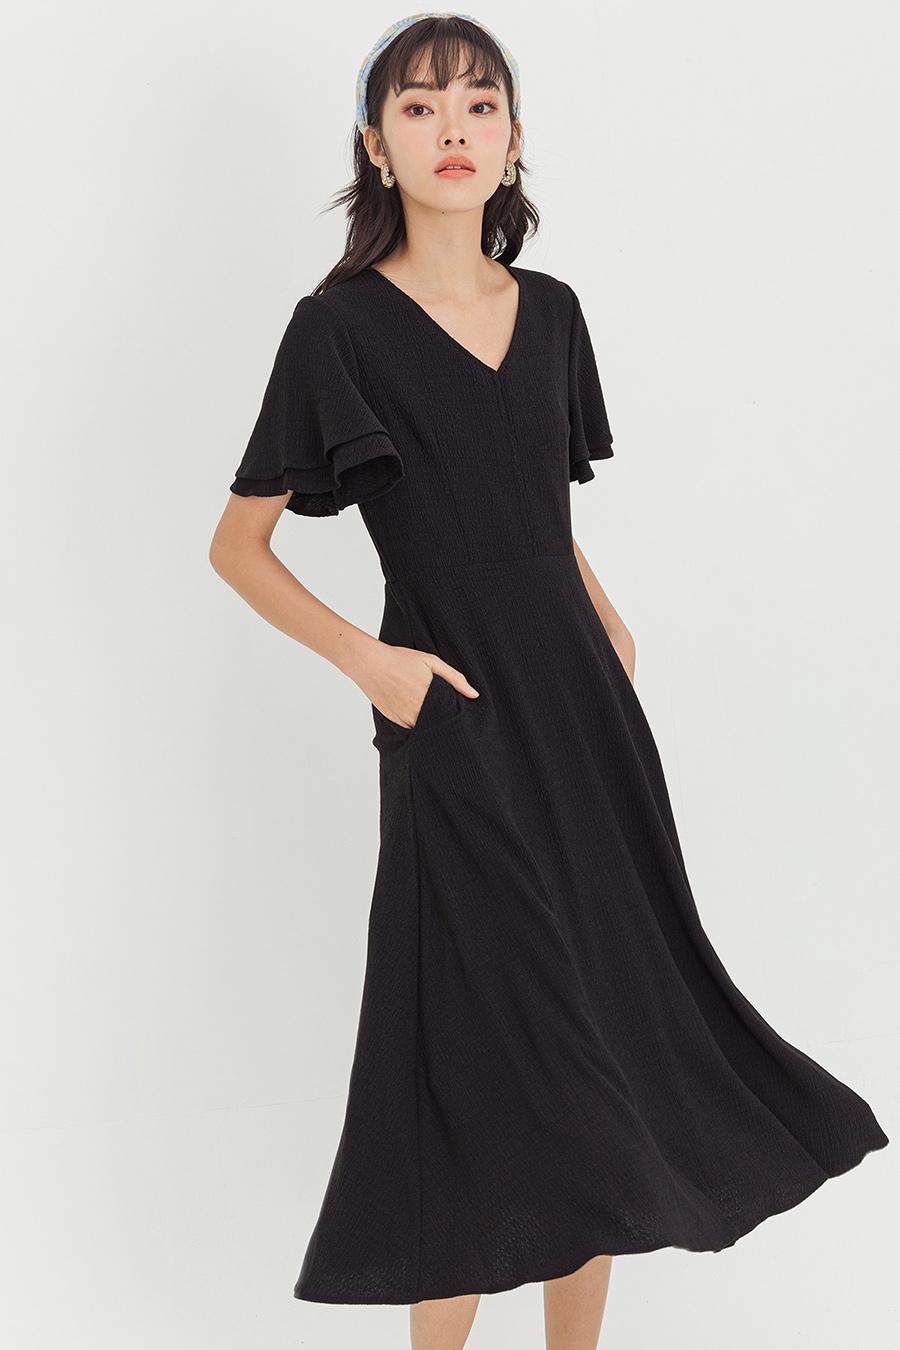 YSABEL DRESS - NOIR [BY MODPARADE]